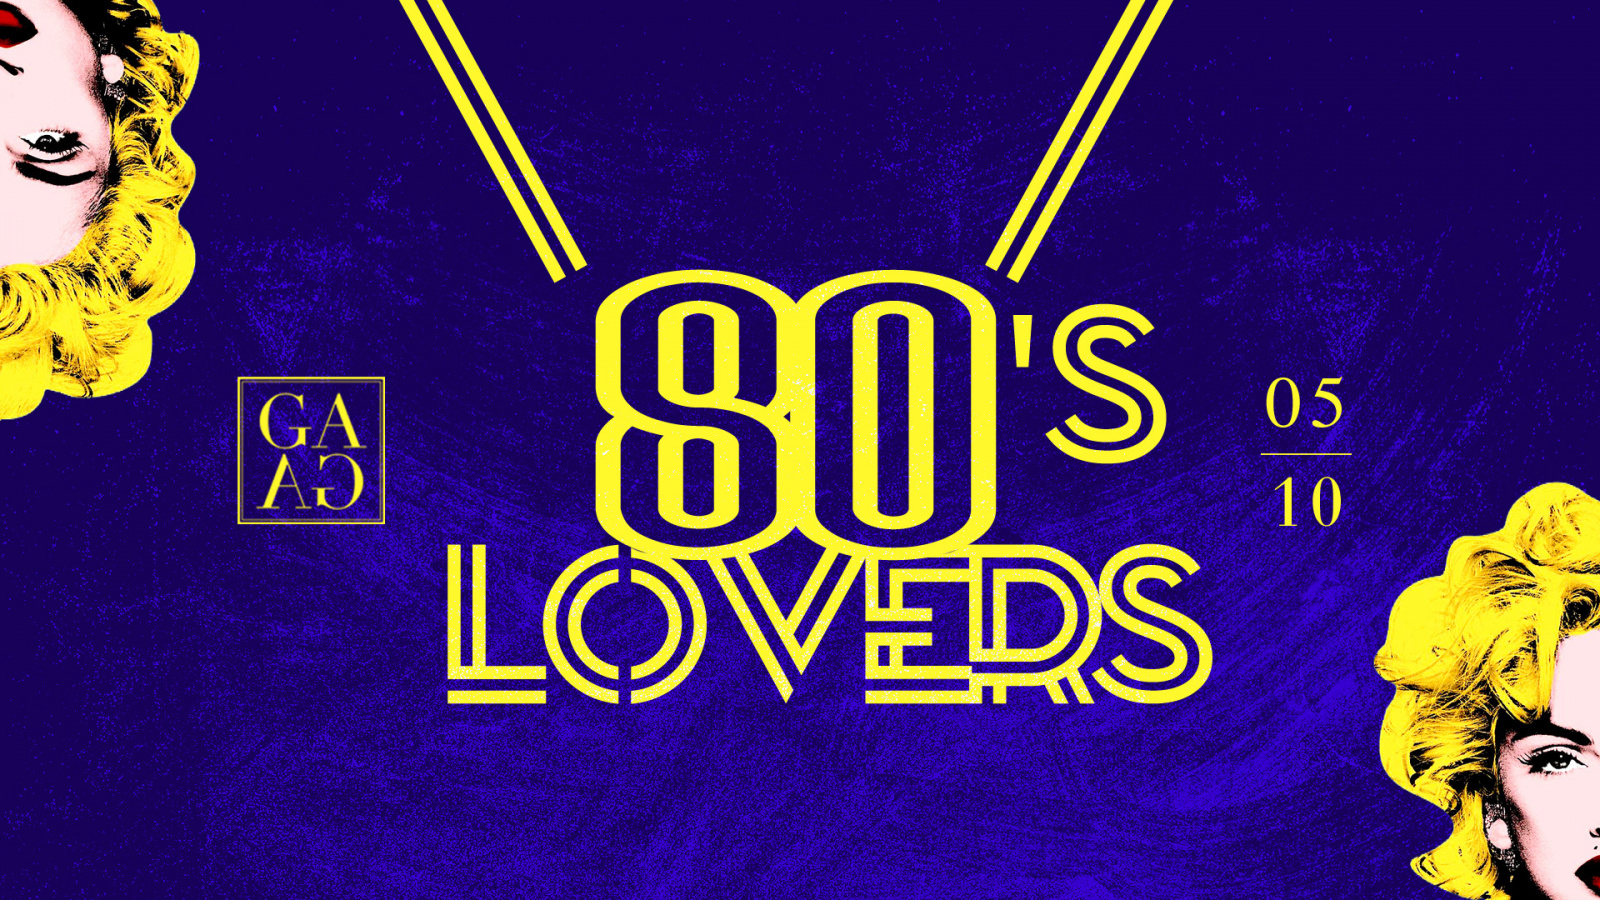 80s Lovers I GAGA